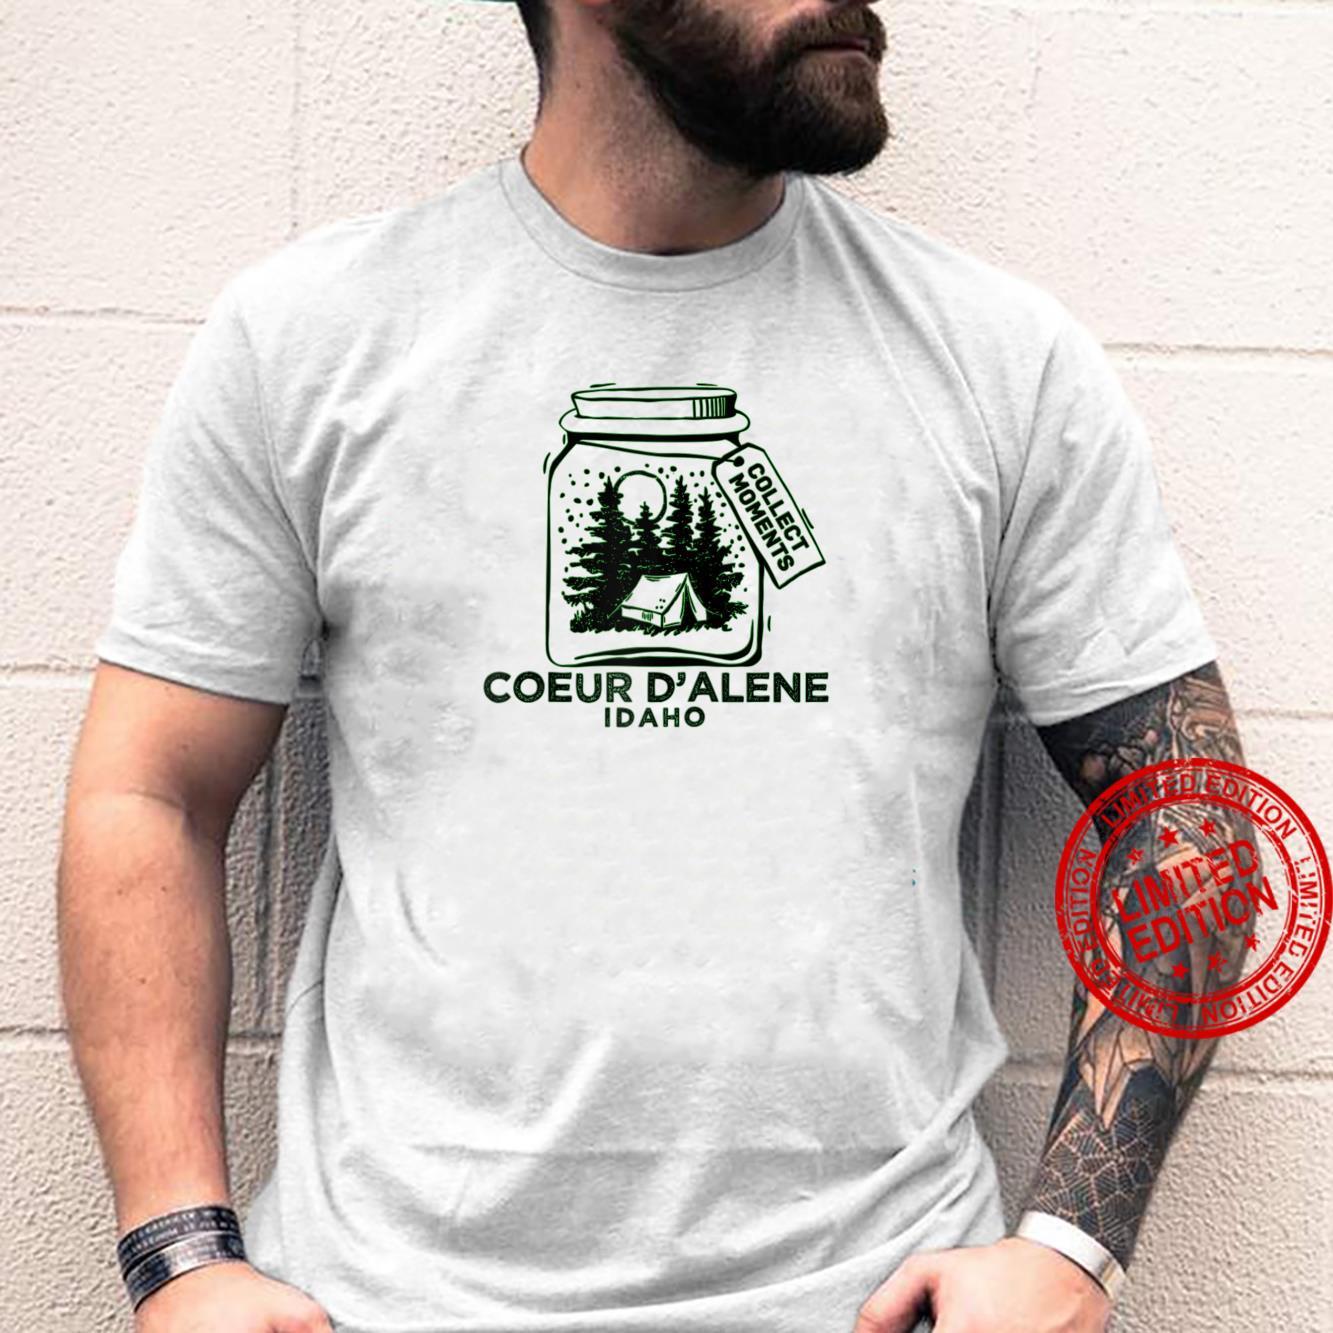 Vintage Coeur d'Alene, Idaho Souvenir Shirt